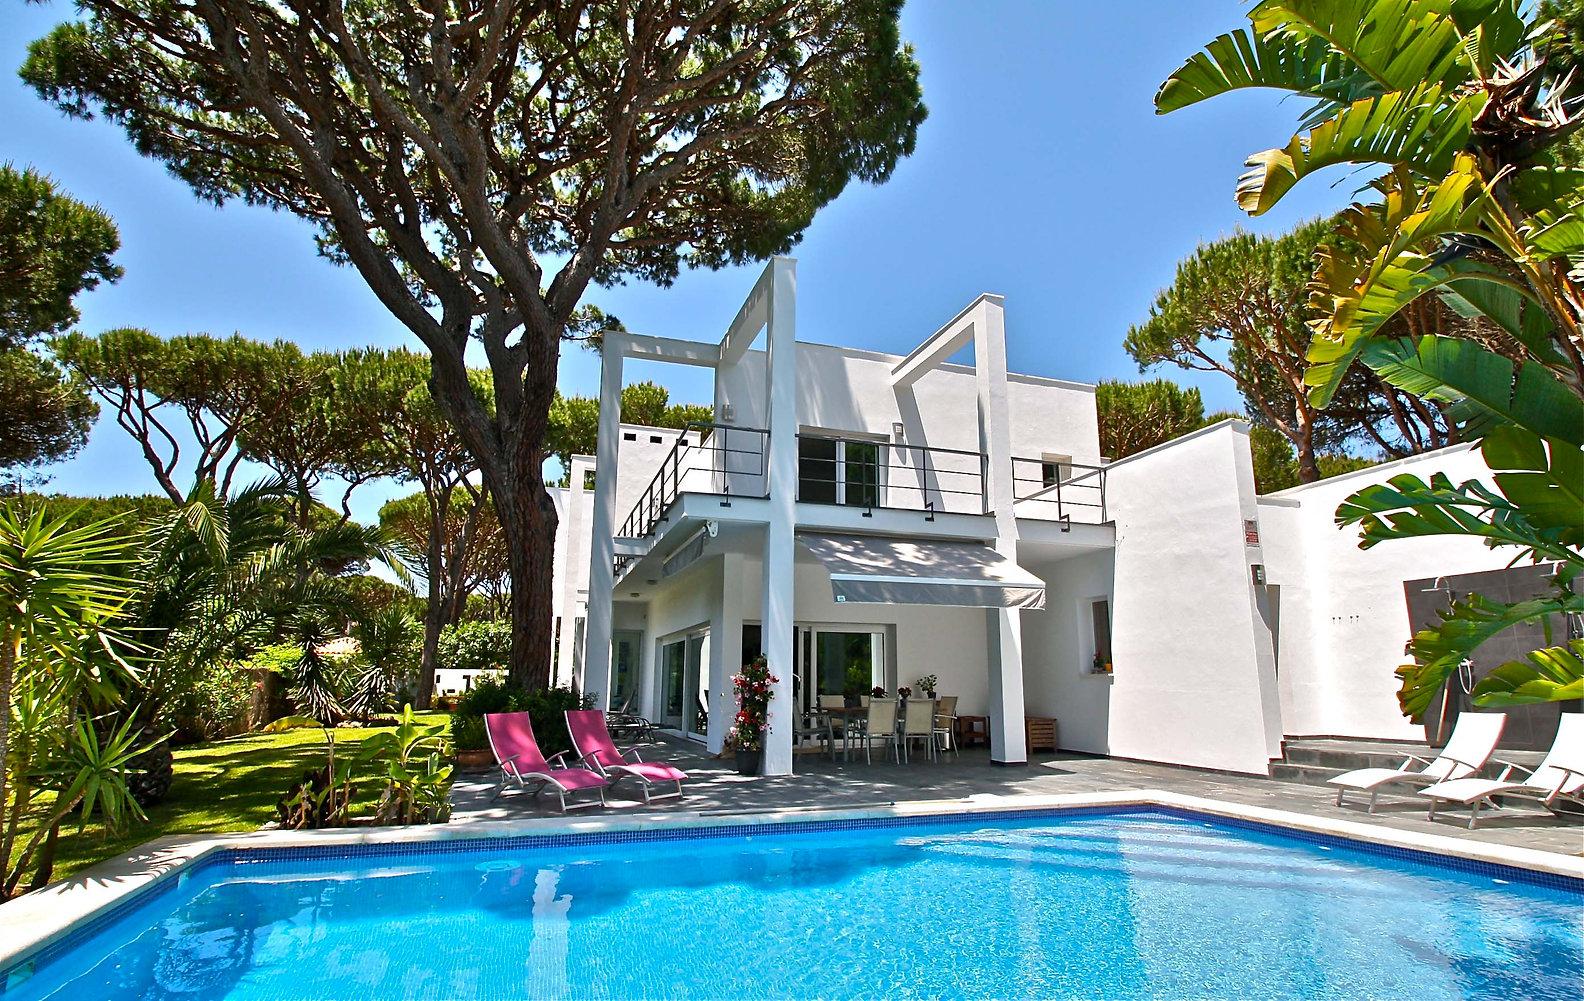 luxury-modern-holiday-home-pool-refv46.j